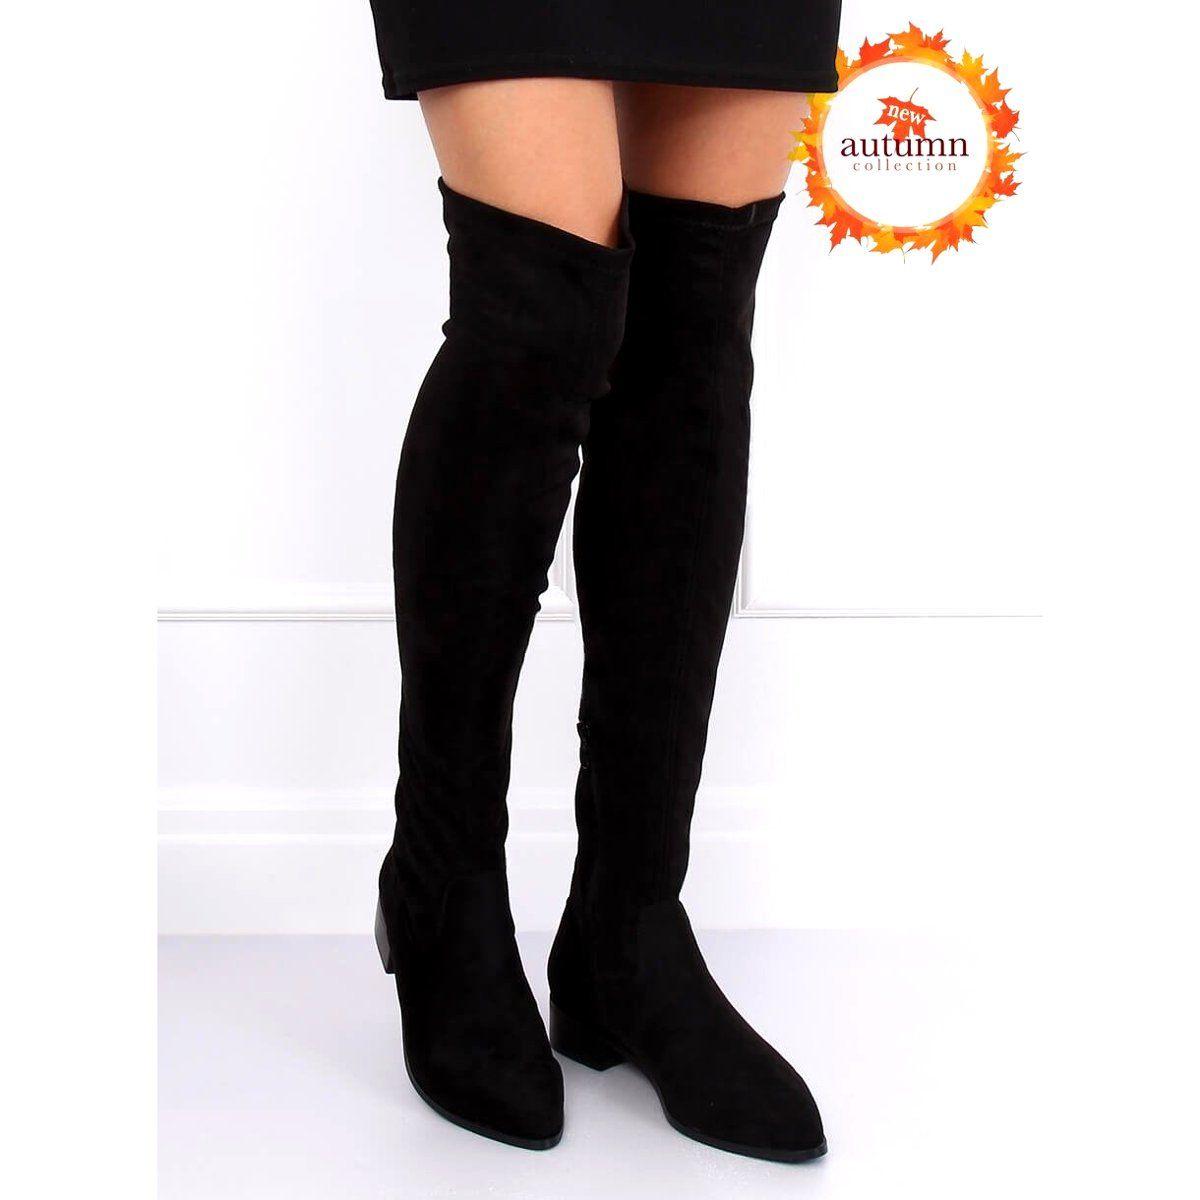 Boots Women S Butymodne Black Thigh High Boots Black Rb34p Black Black Thigh High Boots Black Thigh High Black Boots